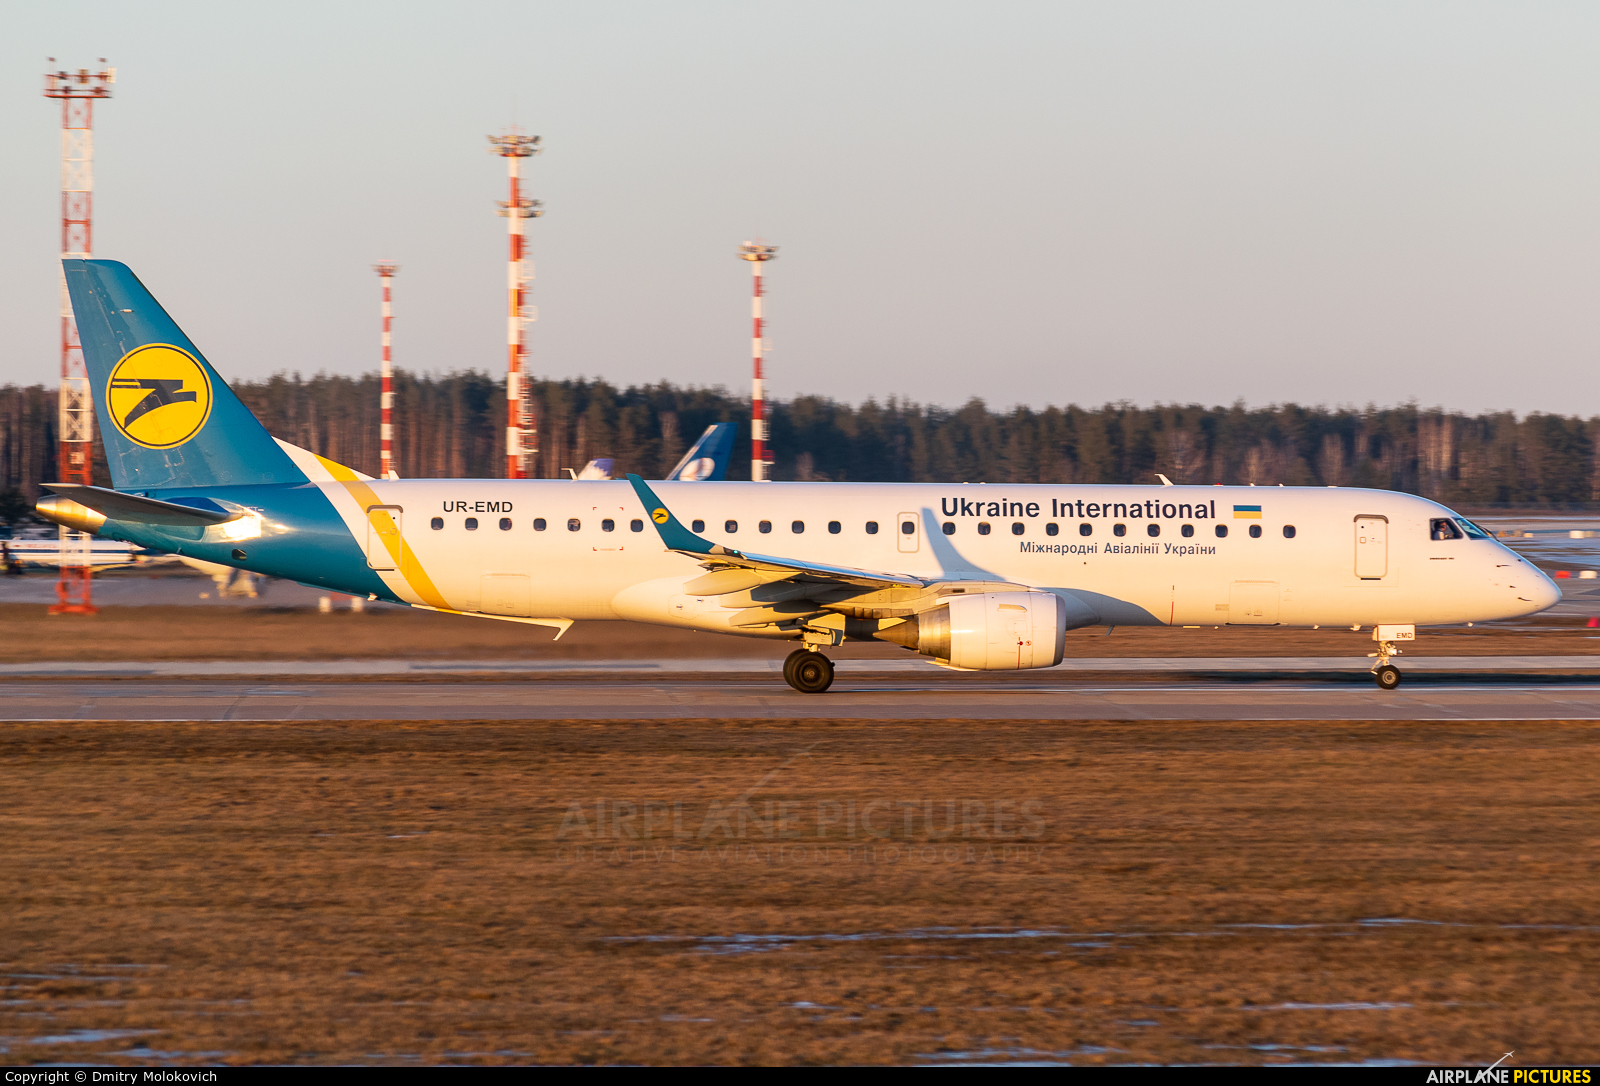 Ukraine International Airlines UR-EMD aircraft at Minsk Intl